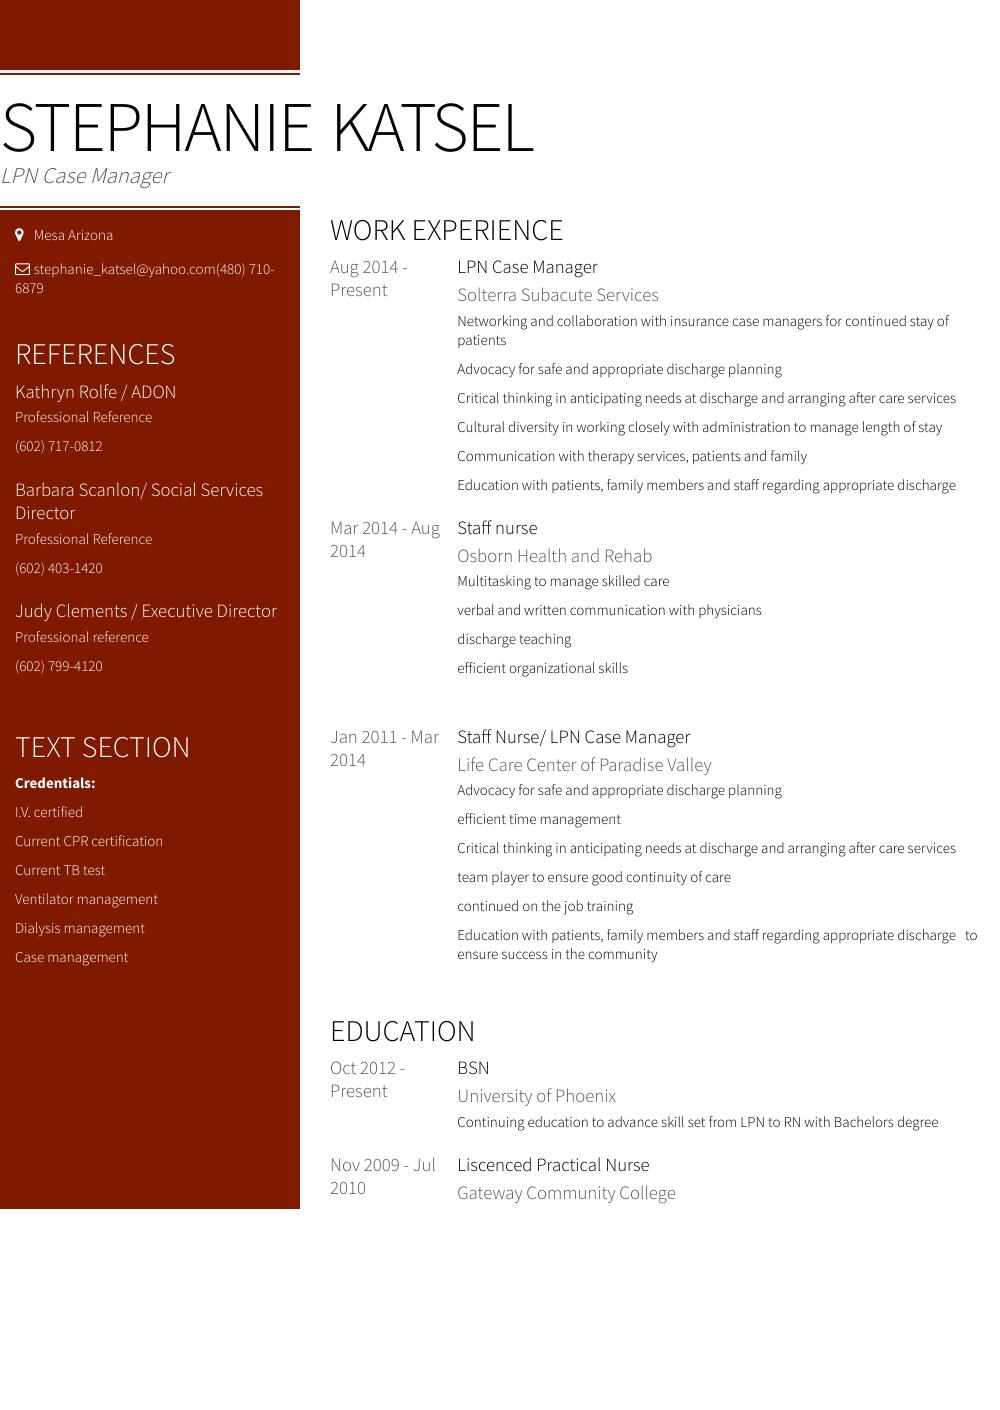 resume tips for lpn